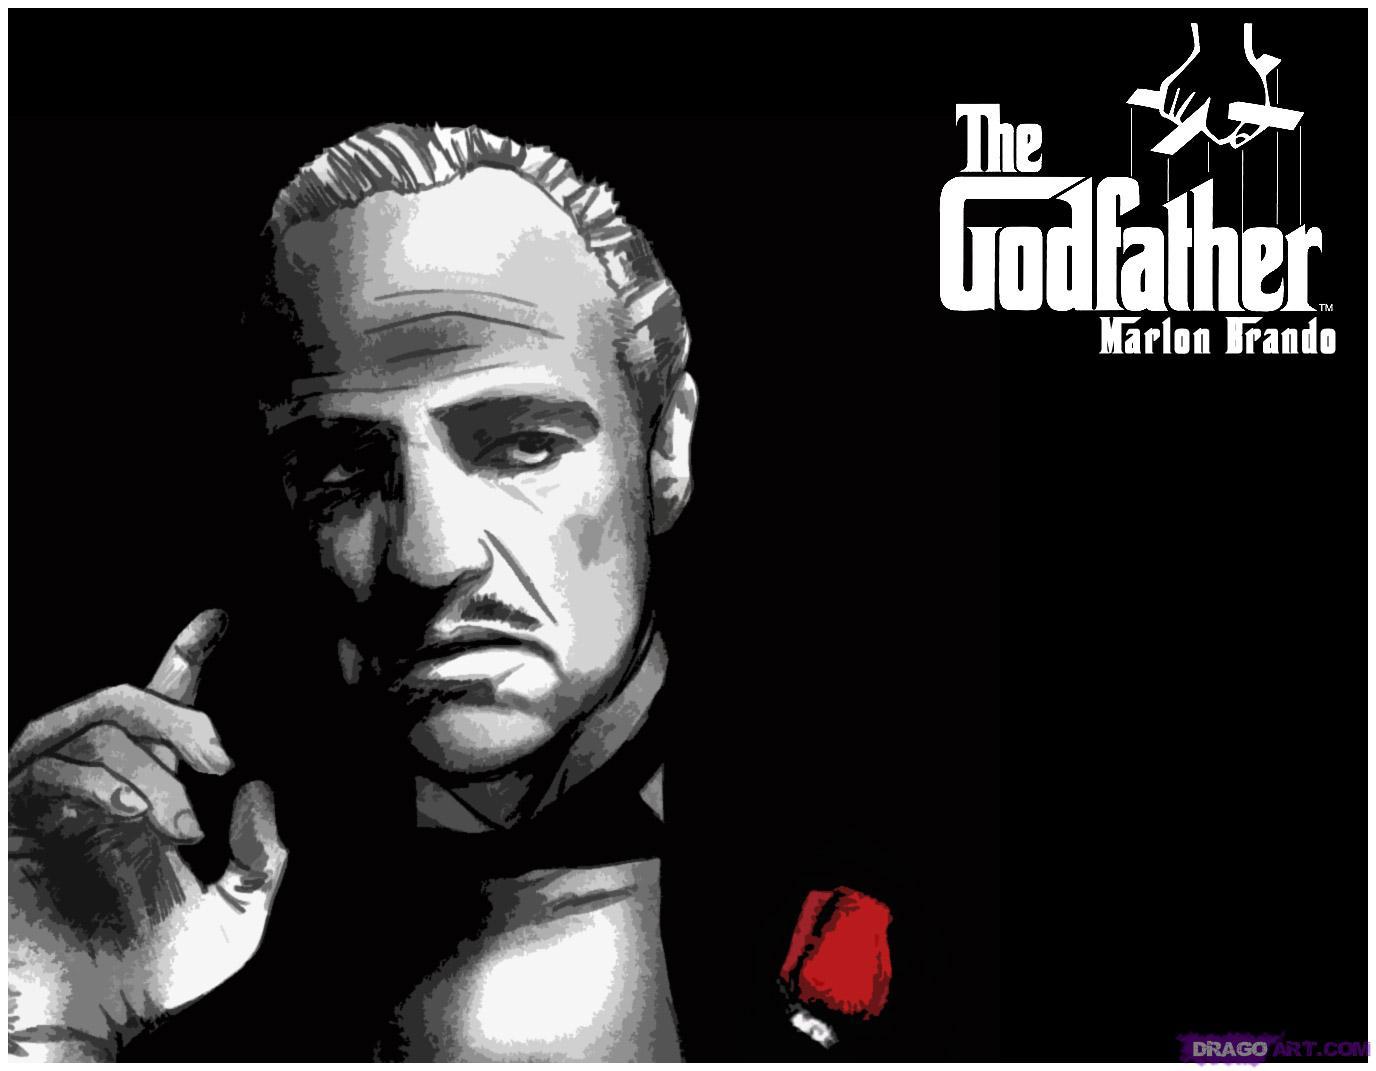 Marlon Brando Godfather Quotes Marlon Brando Godfather - HD Wallpaper